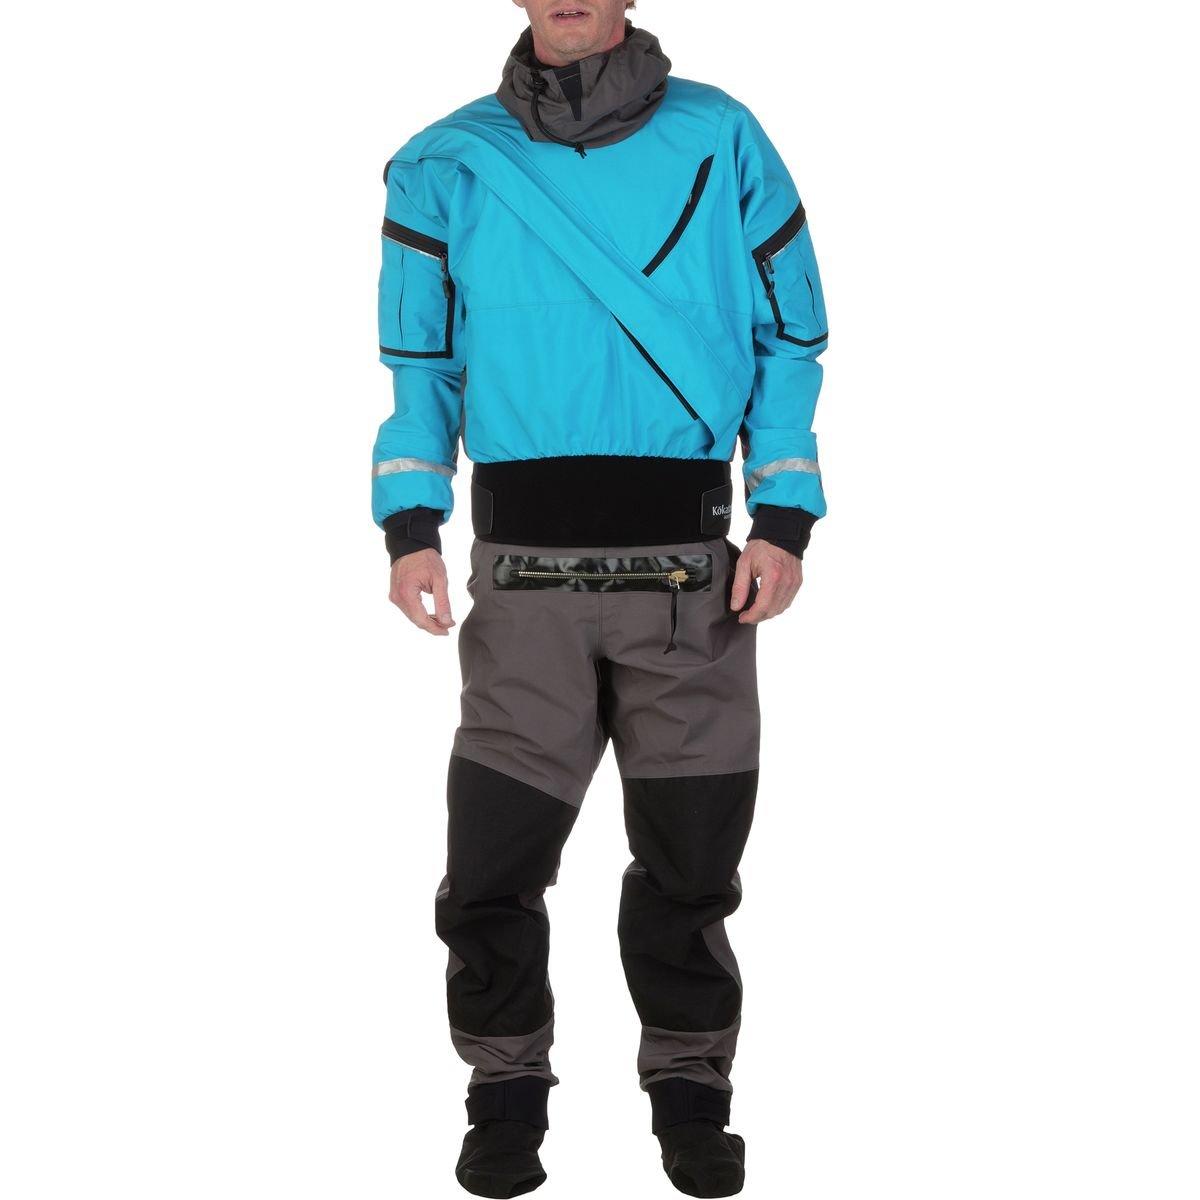 Kokatat Men's GORE-TEX Expedition Drysuit-ElectricBlue-M